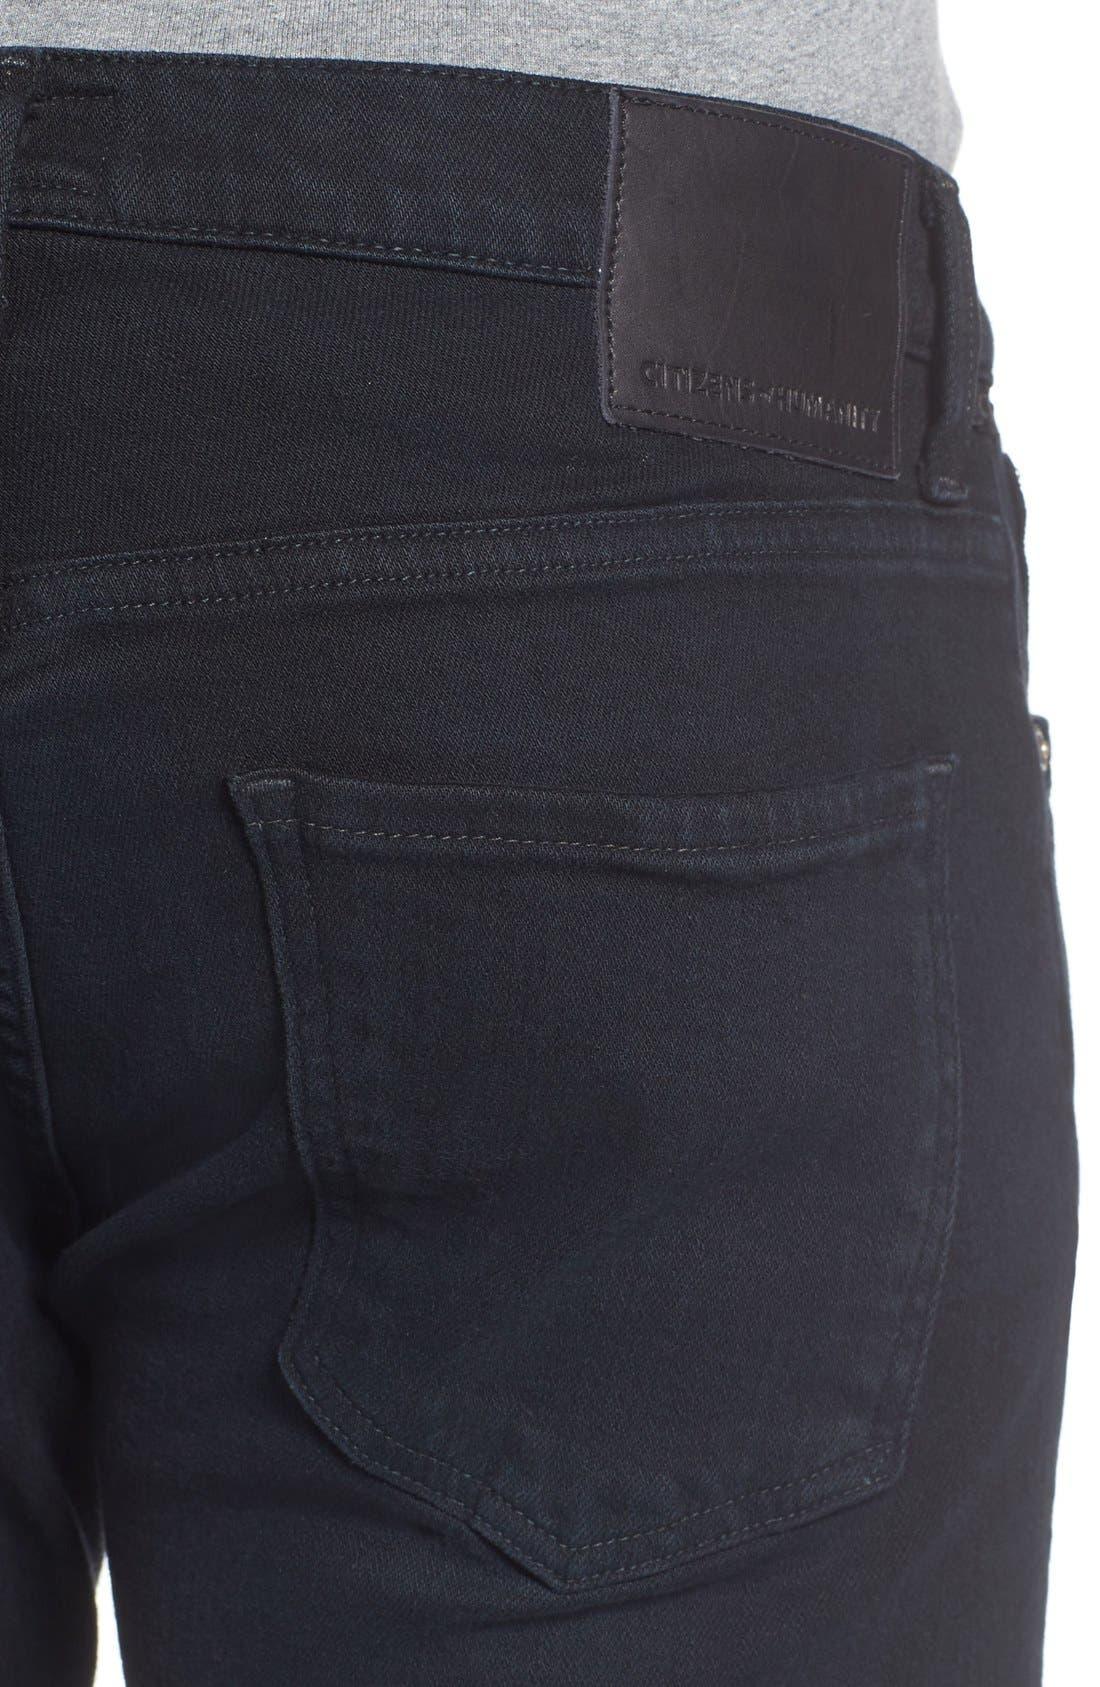 Gage Slim Straight Leg Jeans,                             Alternate thumbnail 8, color,                             401